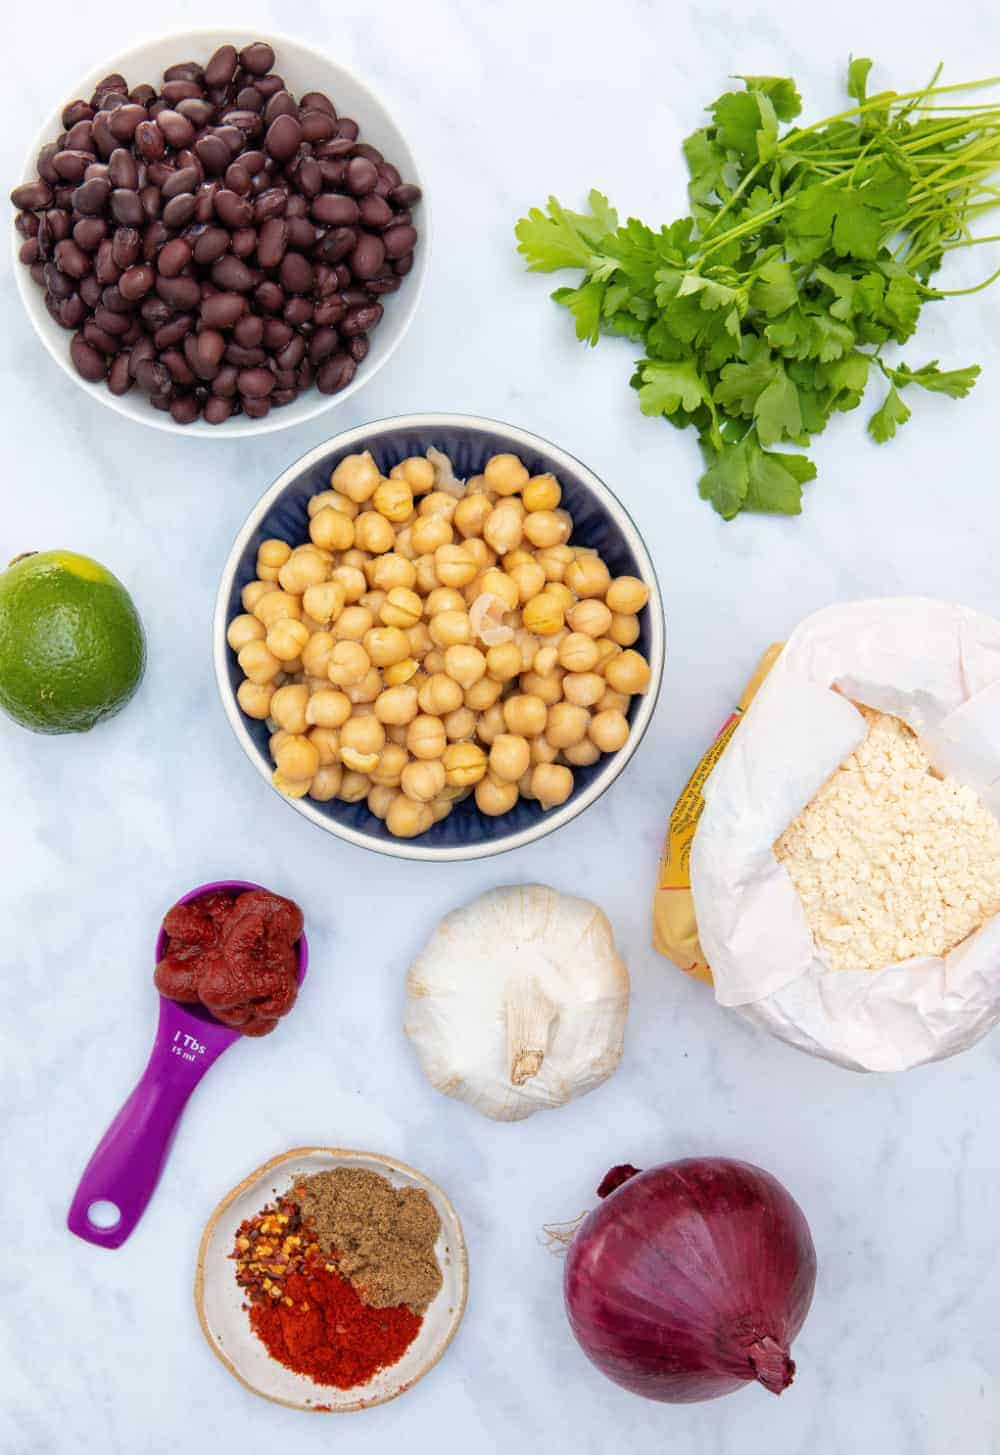 Gluten Free Falafels - ingredients